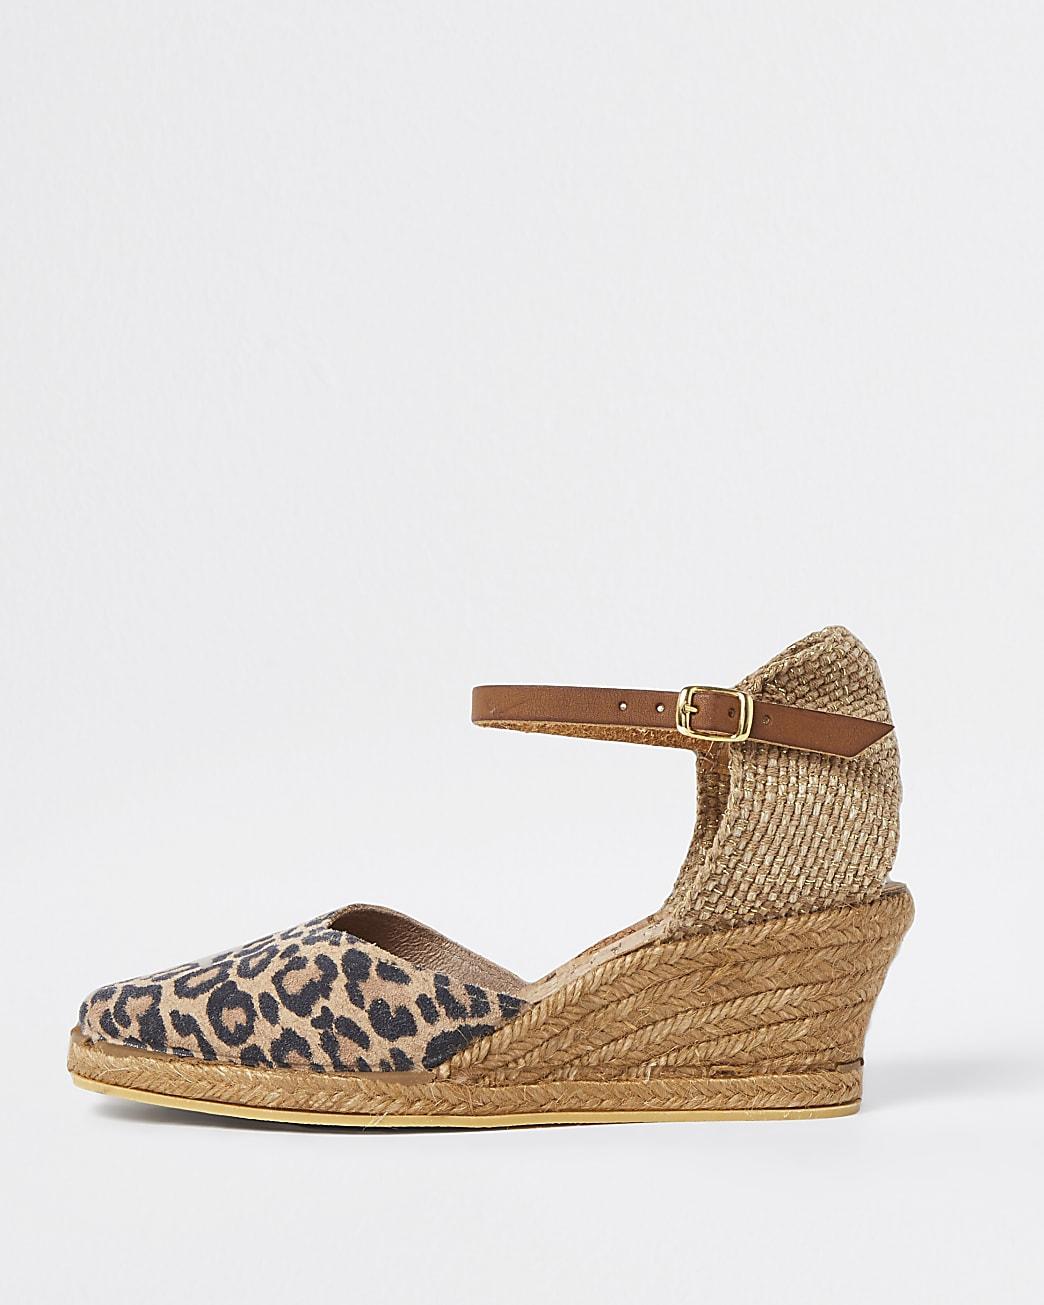 Ravel brown wedge sandals